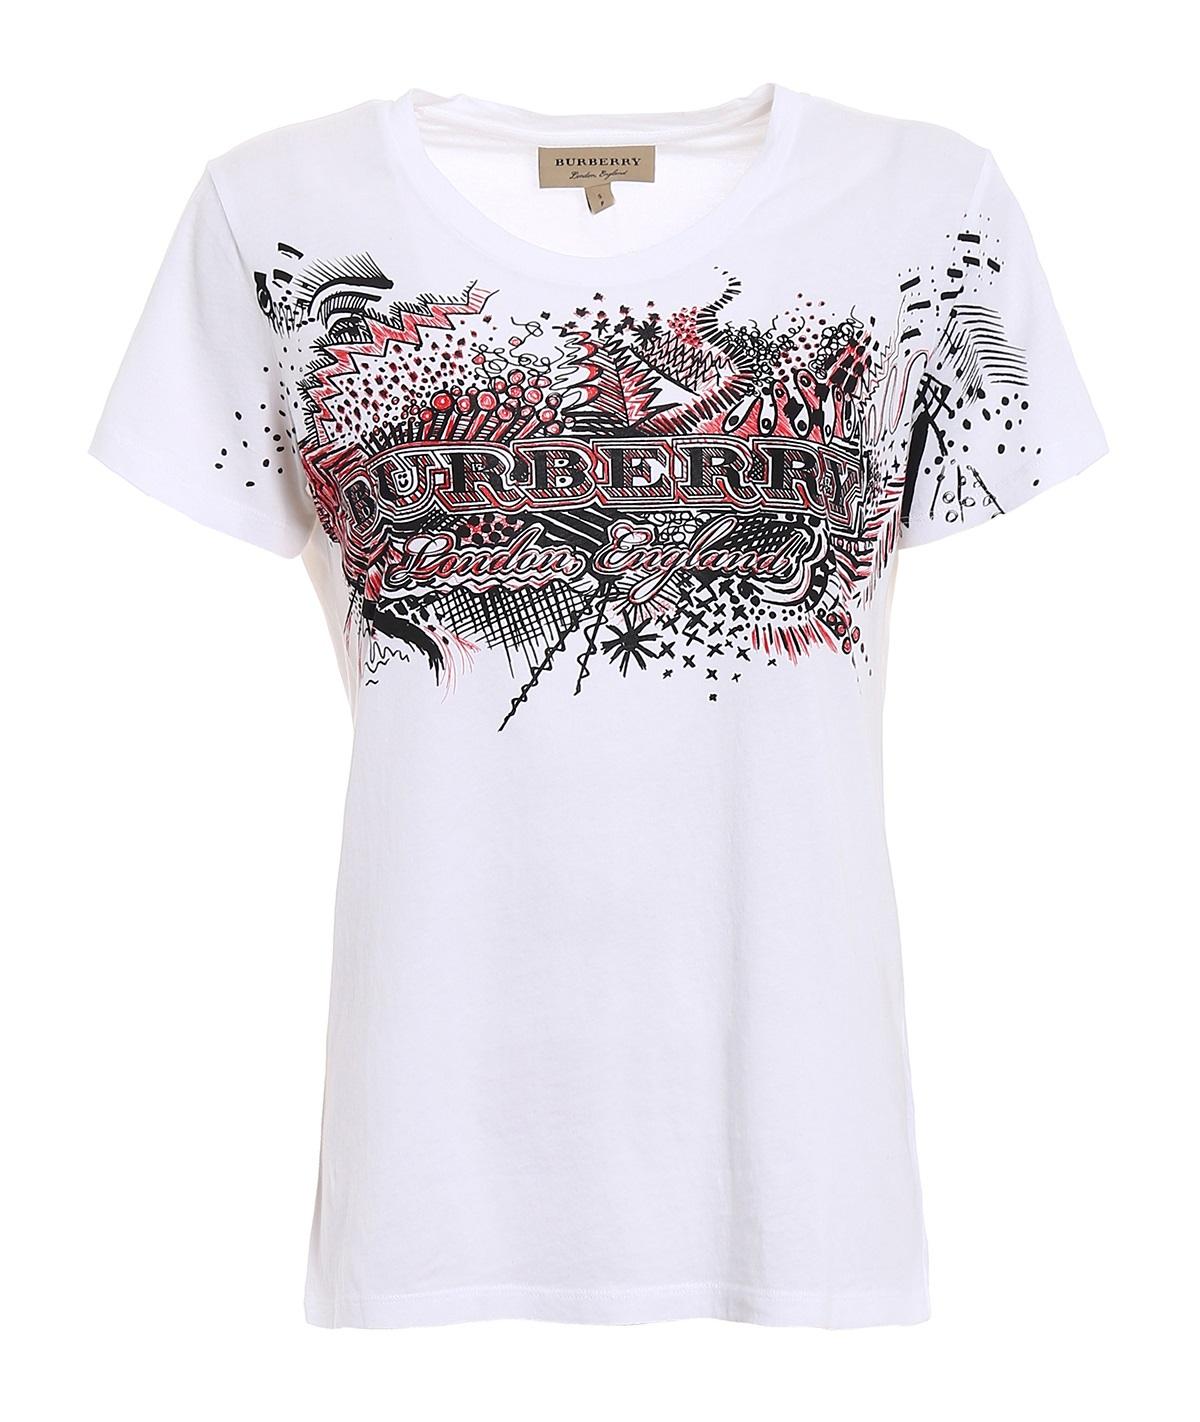 Burberry White Doodle Print T-shirt